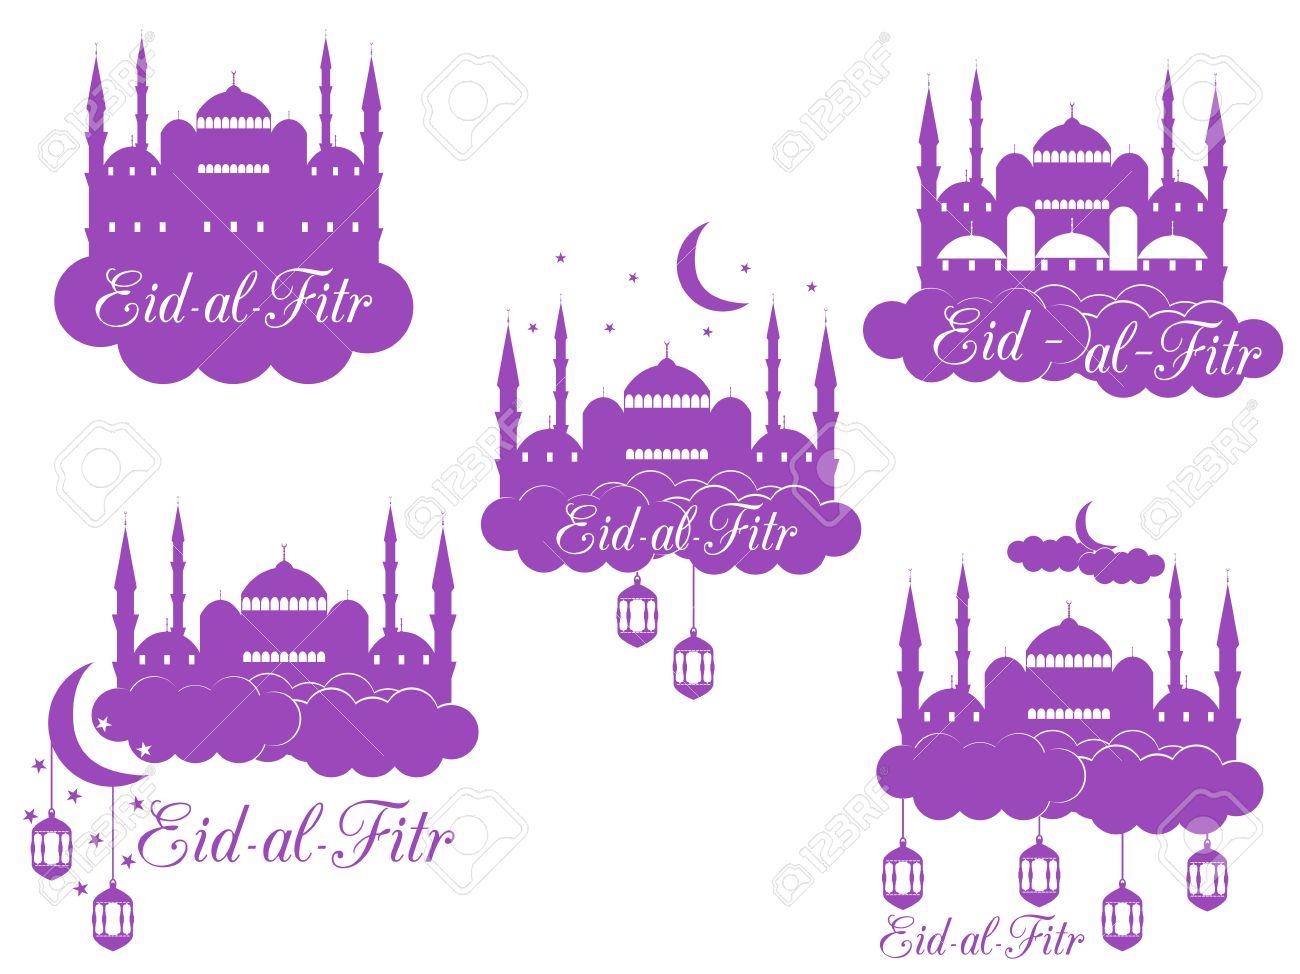 Beautiful Traditional Eid Al-Fitr Decorations - 59958011-ramadan-kareem-mosque-minaret-lantern-and-moon-eid-al-fitr-muslim-traditional-holiday-eid-mubarak-ve  You Should Have_83912 .jpg